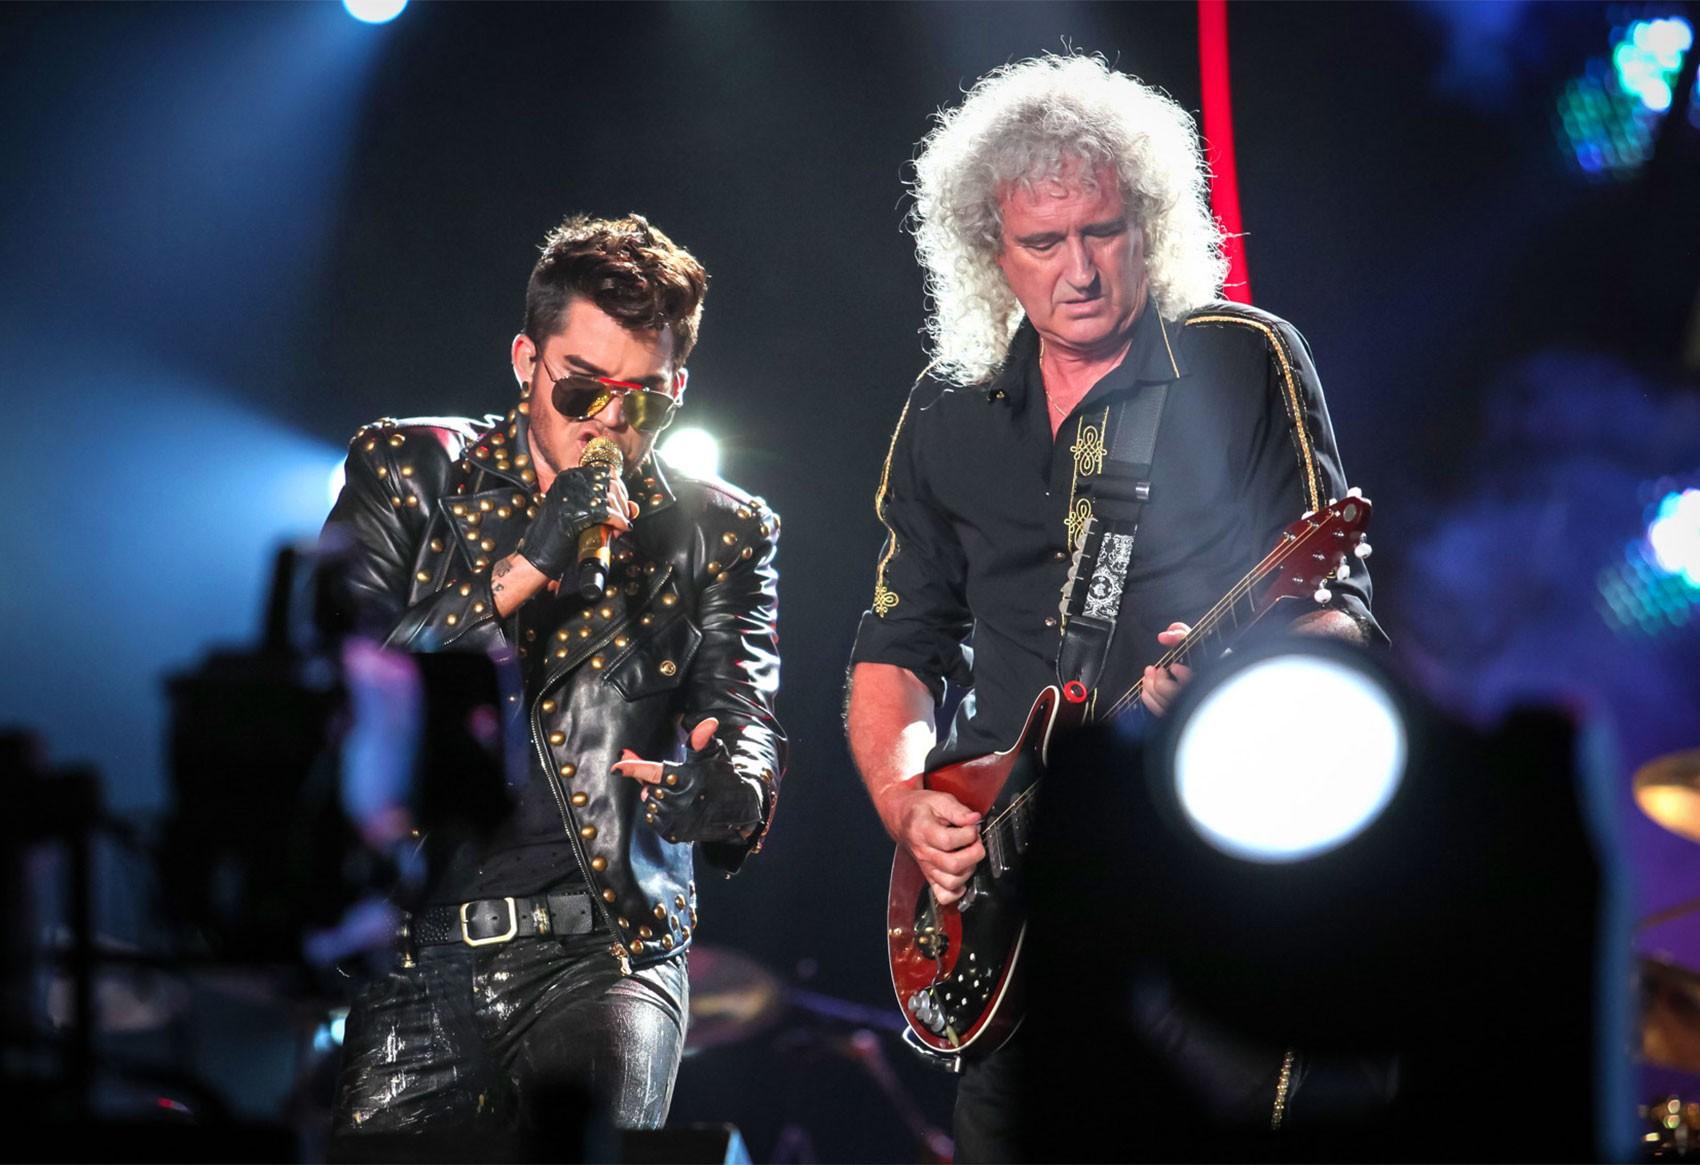 Oscar 2019 terá performance do Queen com Adam Lambert - Noticias